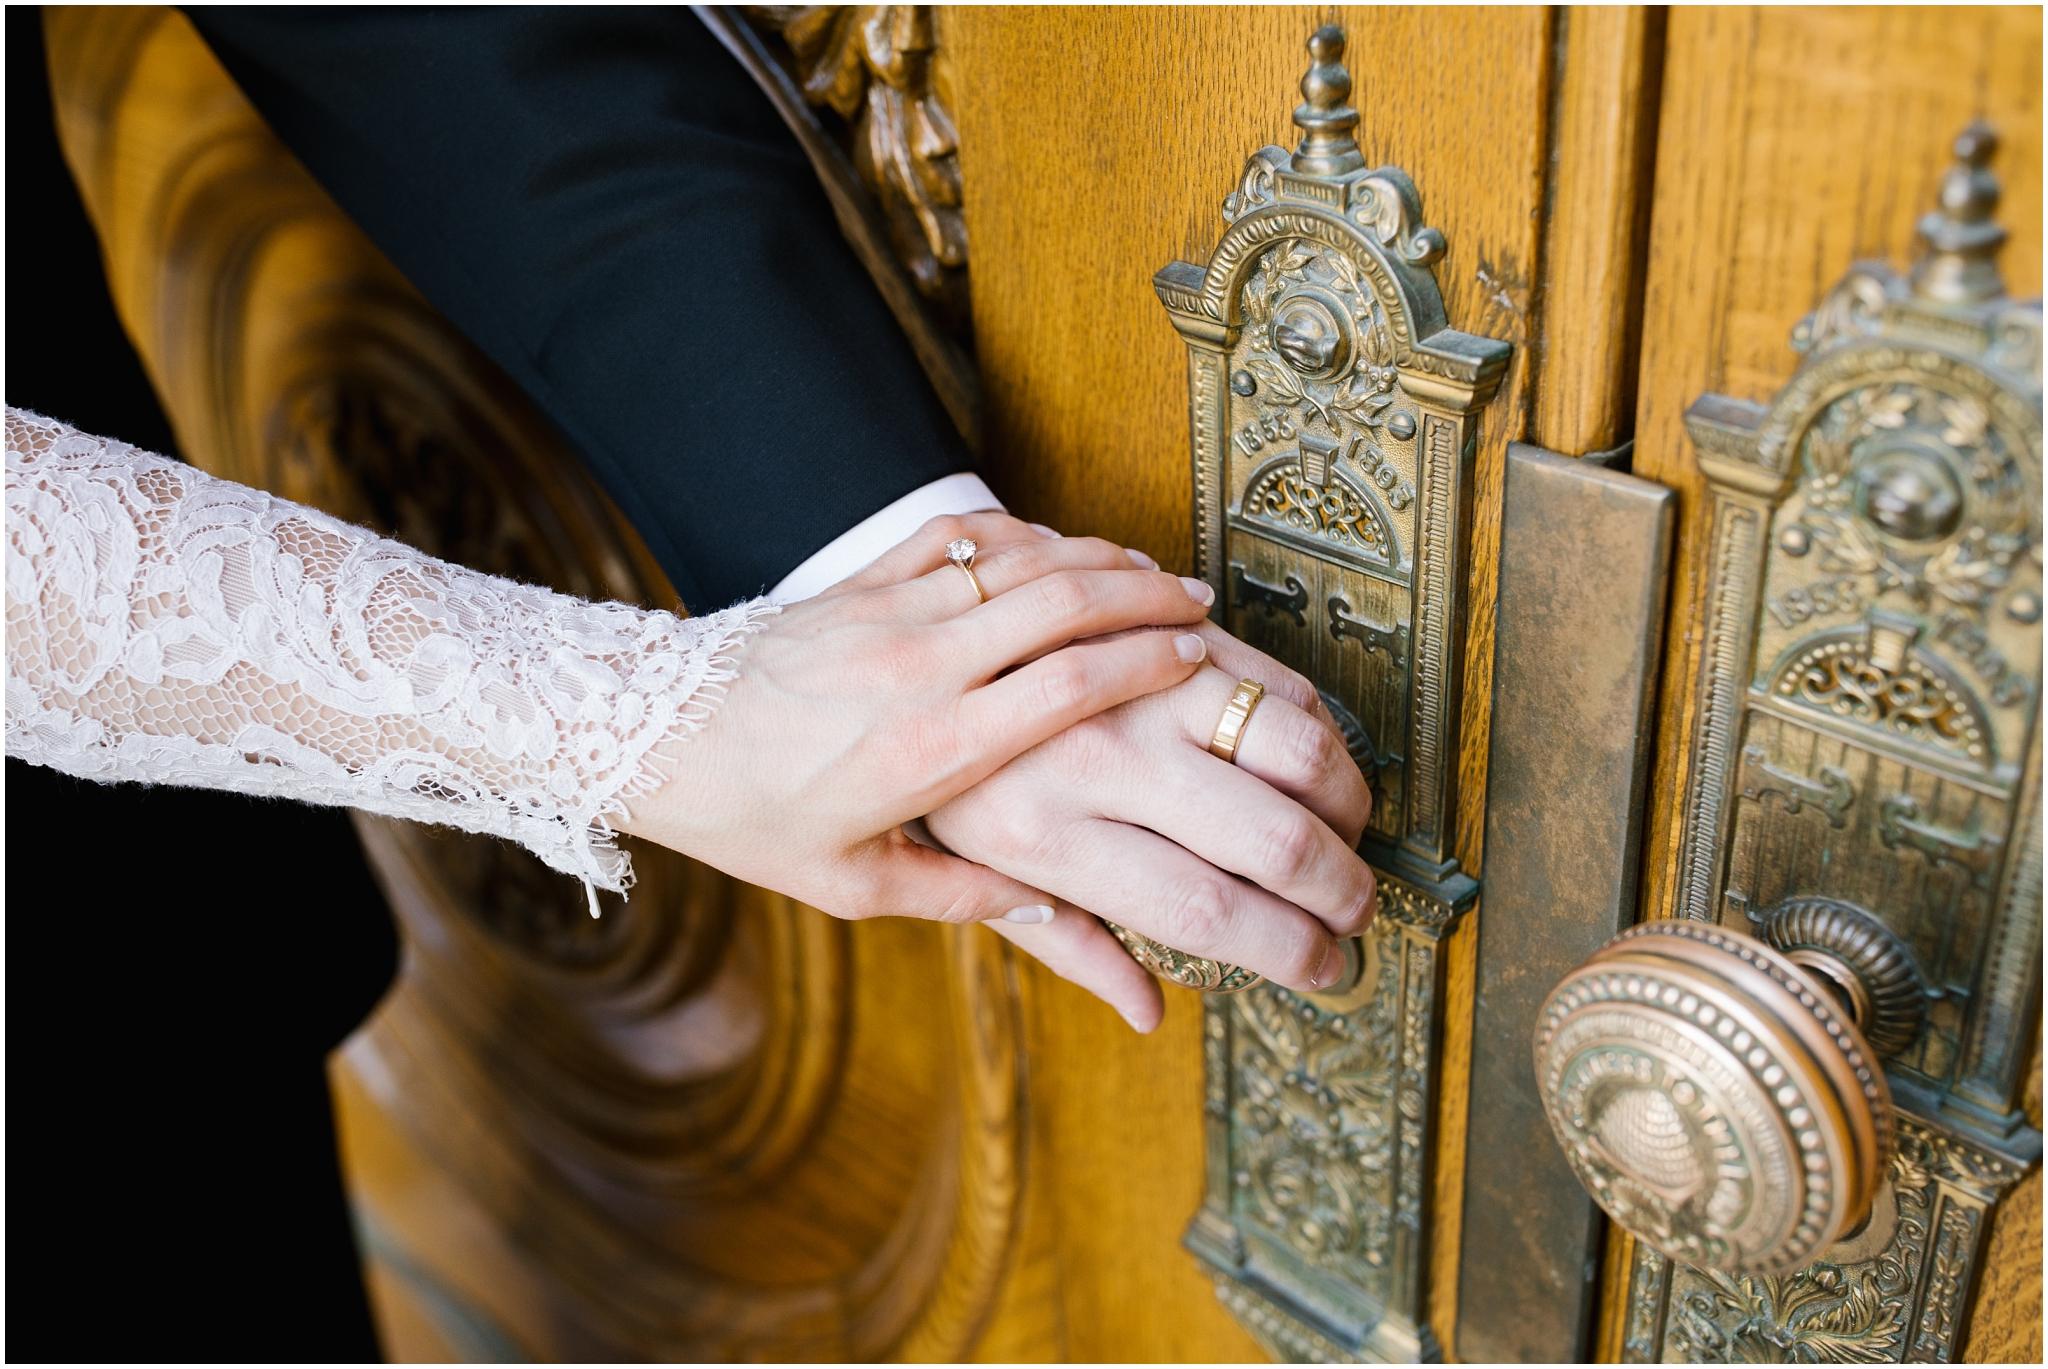 CherylandTyler-137_Lizzie-B-Imagery-Utah-Wedding-Photographer-Salt-Lake-City-Temple-Wells-Fargo-Building-Reception.jpg